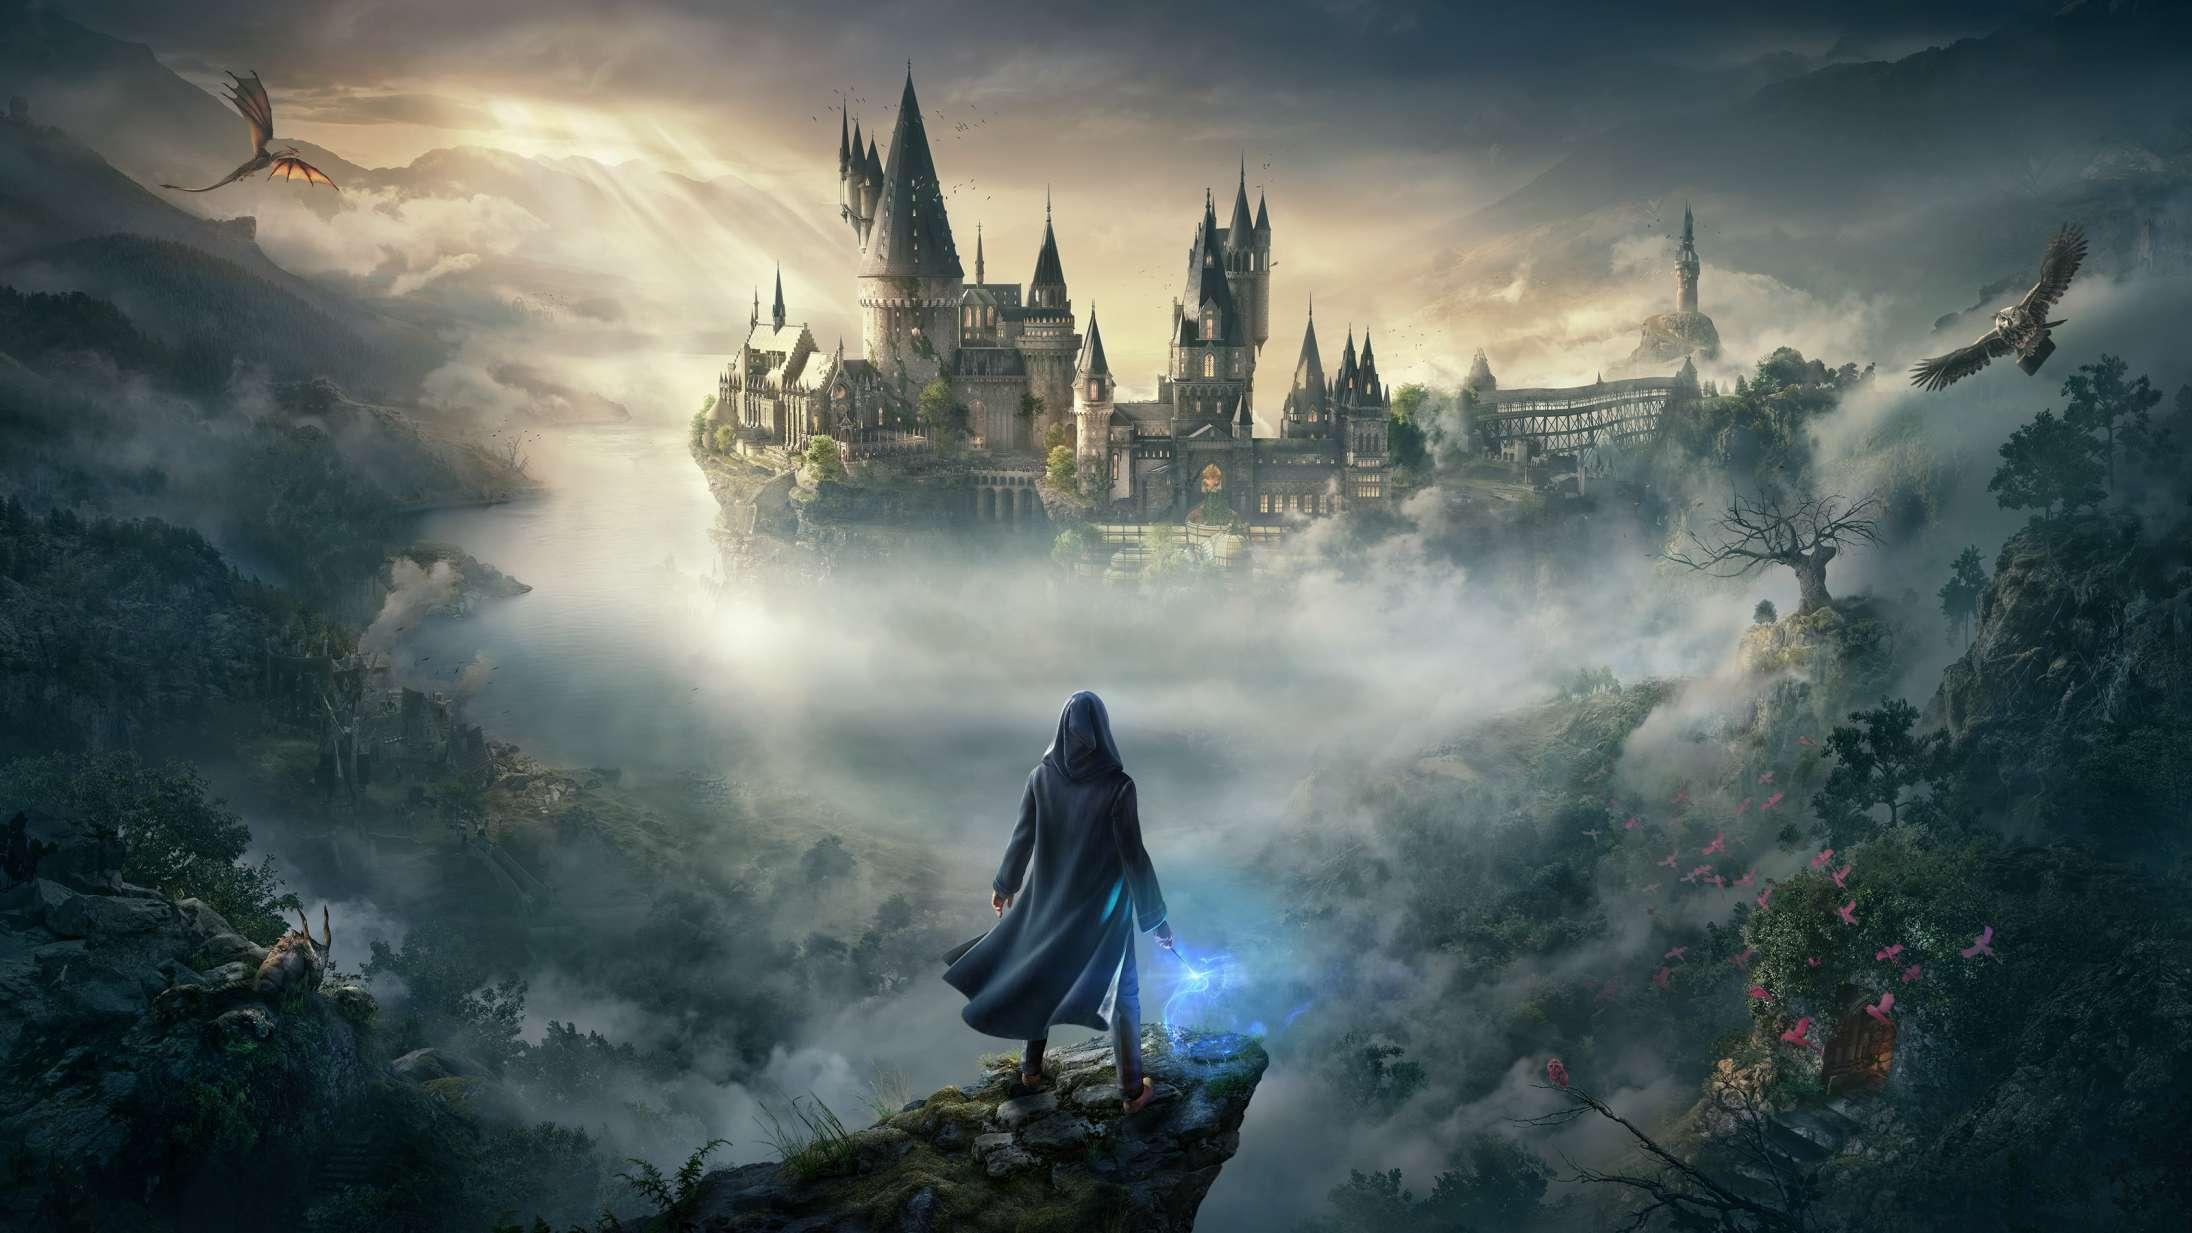 Pak tryllestaven væk: 'Harry Potter'-spillet, vi alle har ventet på, forsinkes til 2022